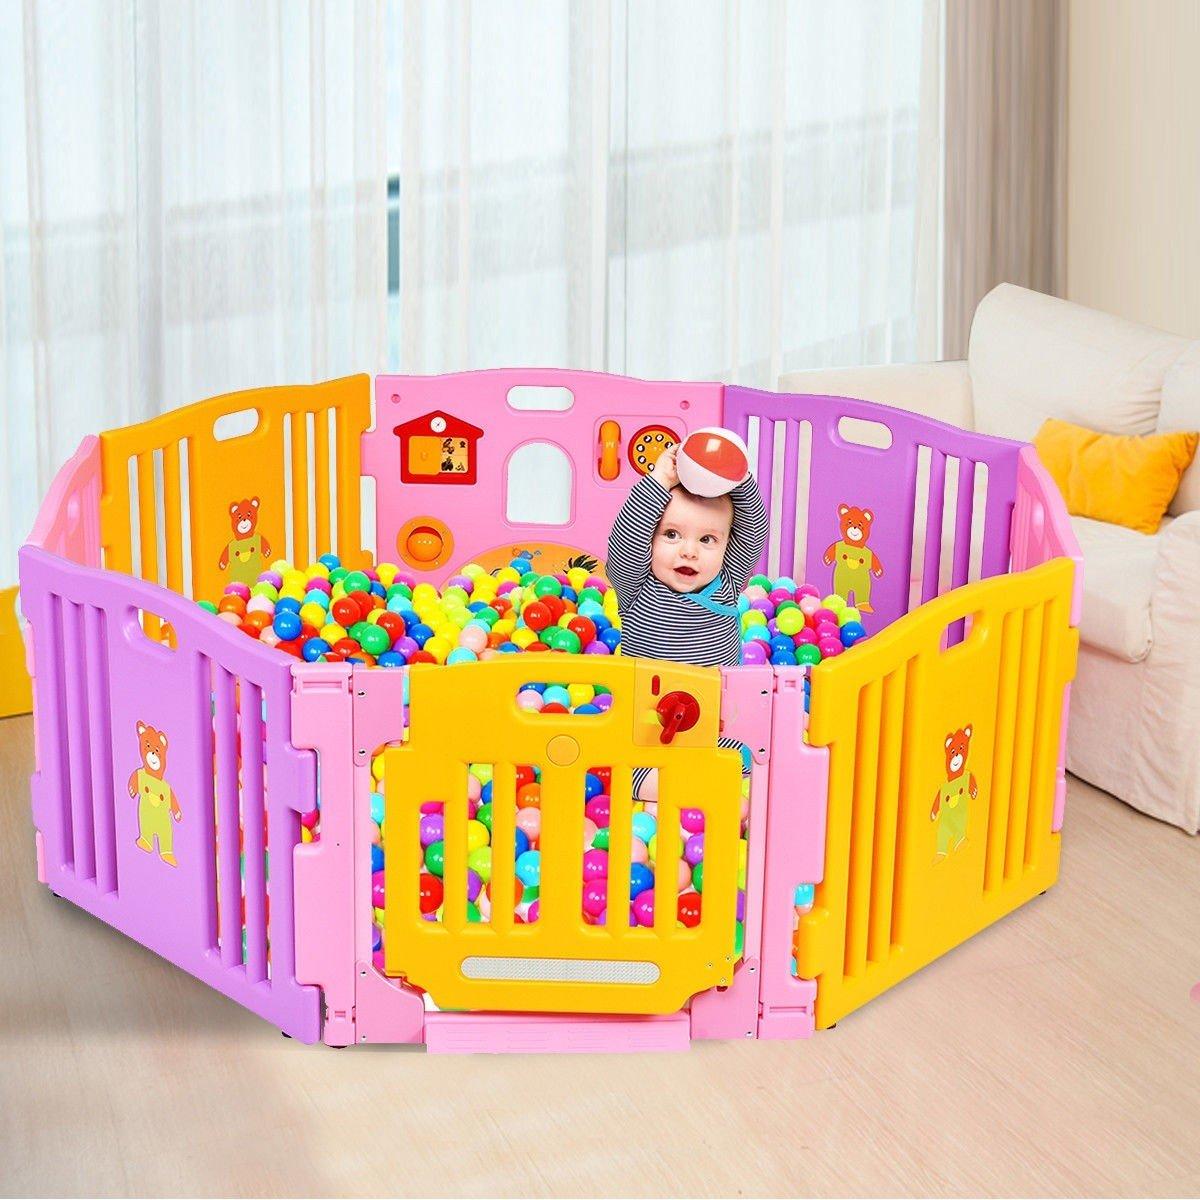 Pink 8 Panel Baby Playpen Kids Safety Play Center Center Yard Pink Indoor CHOOSEandBUY by CHOOSEandBUY (Image #2)